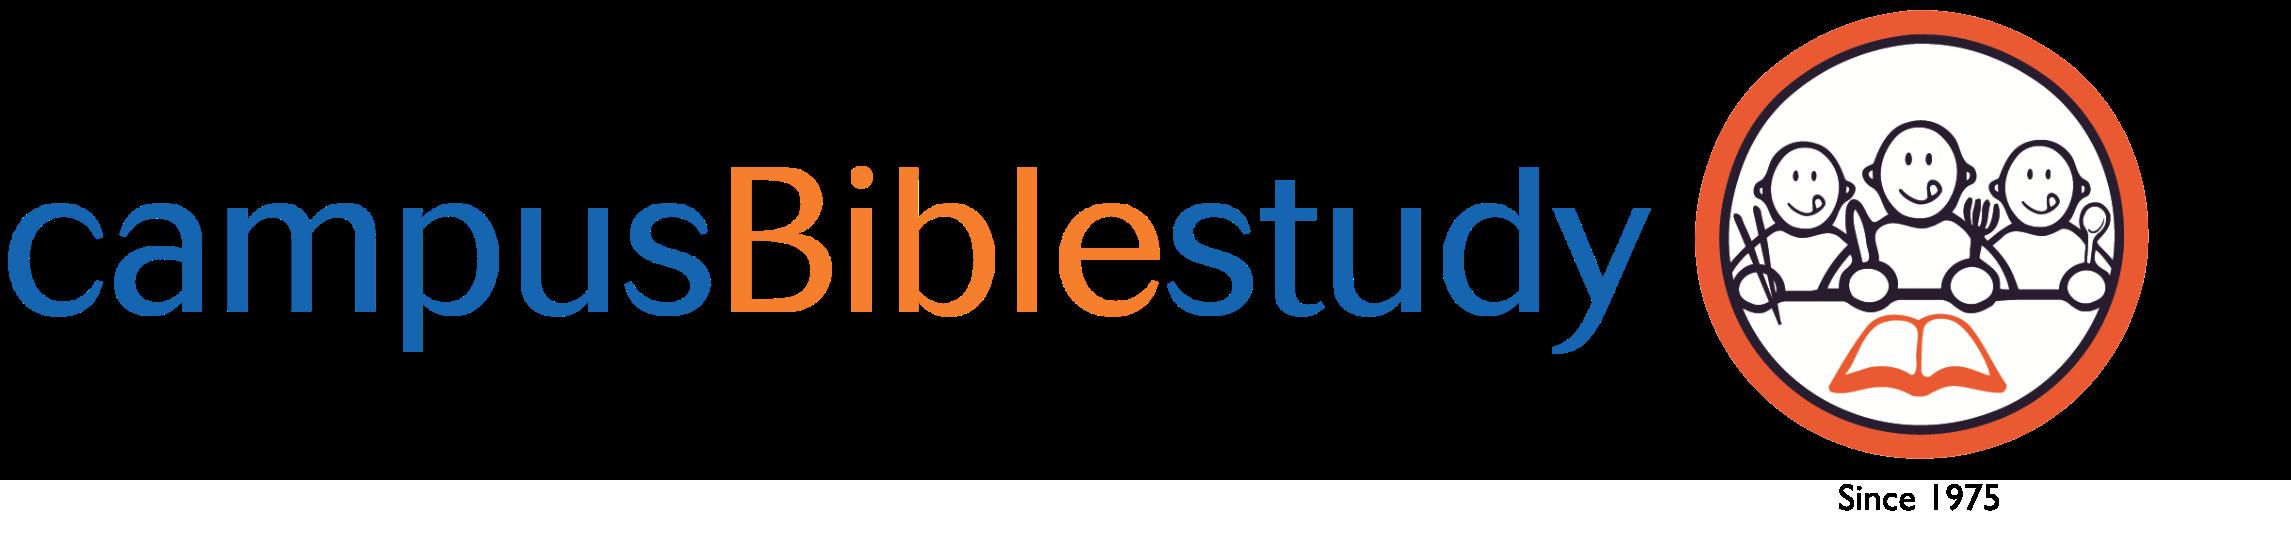 CBS banner logo (trans)